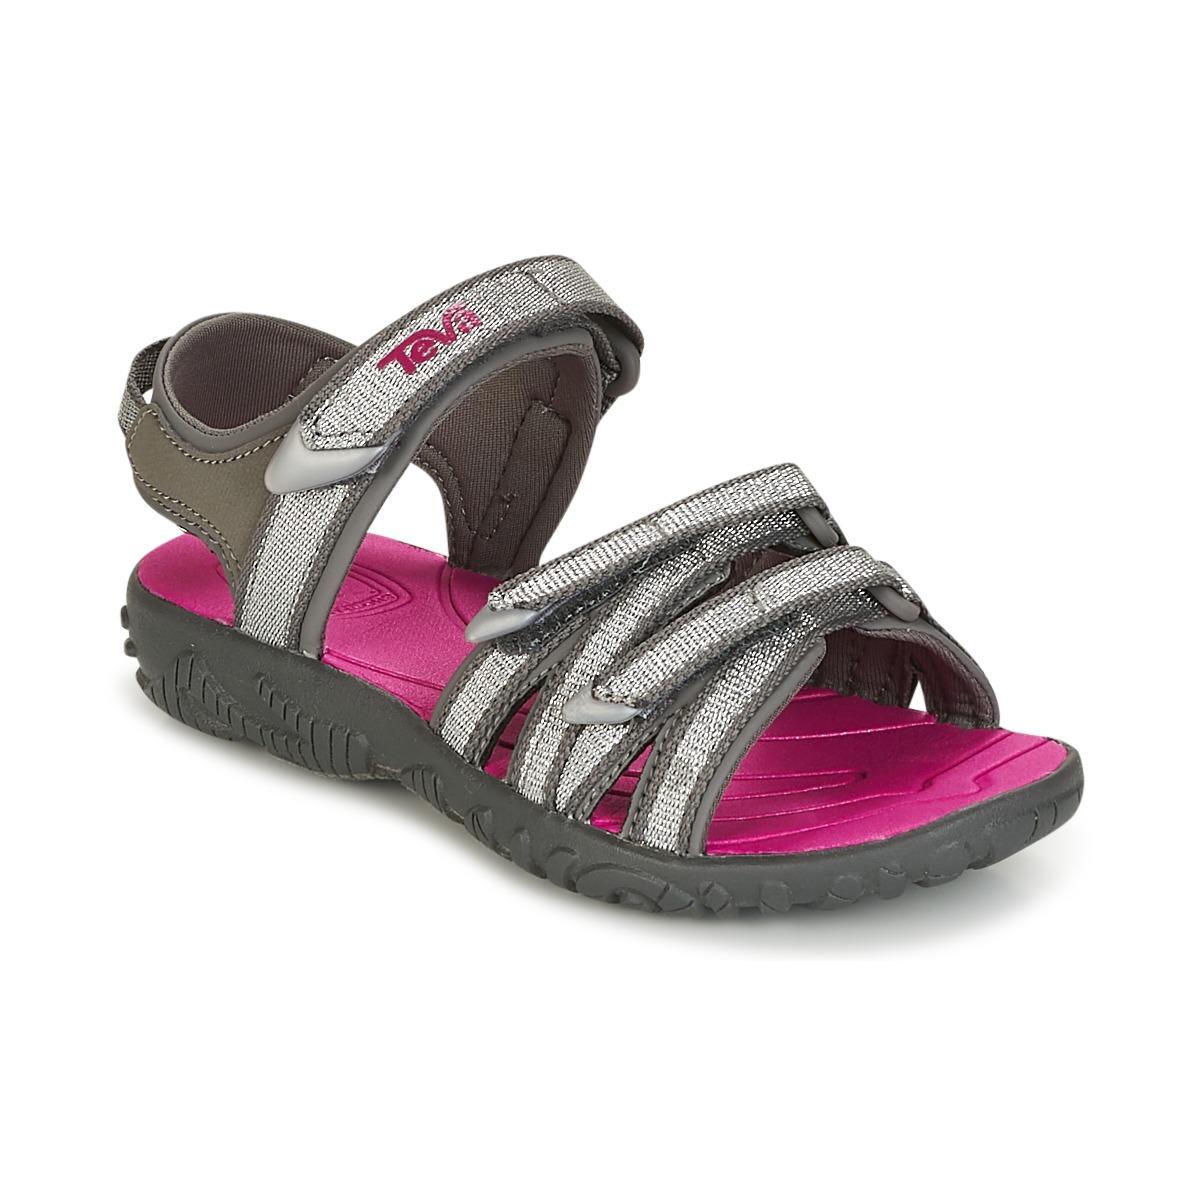 3a3c25fa1d05 Sandaler til børn Teva TIRRA